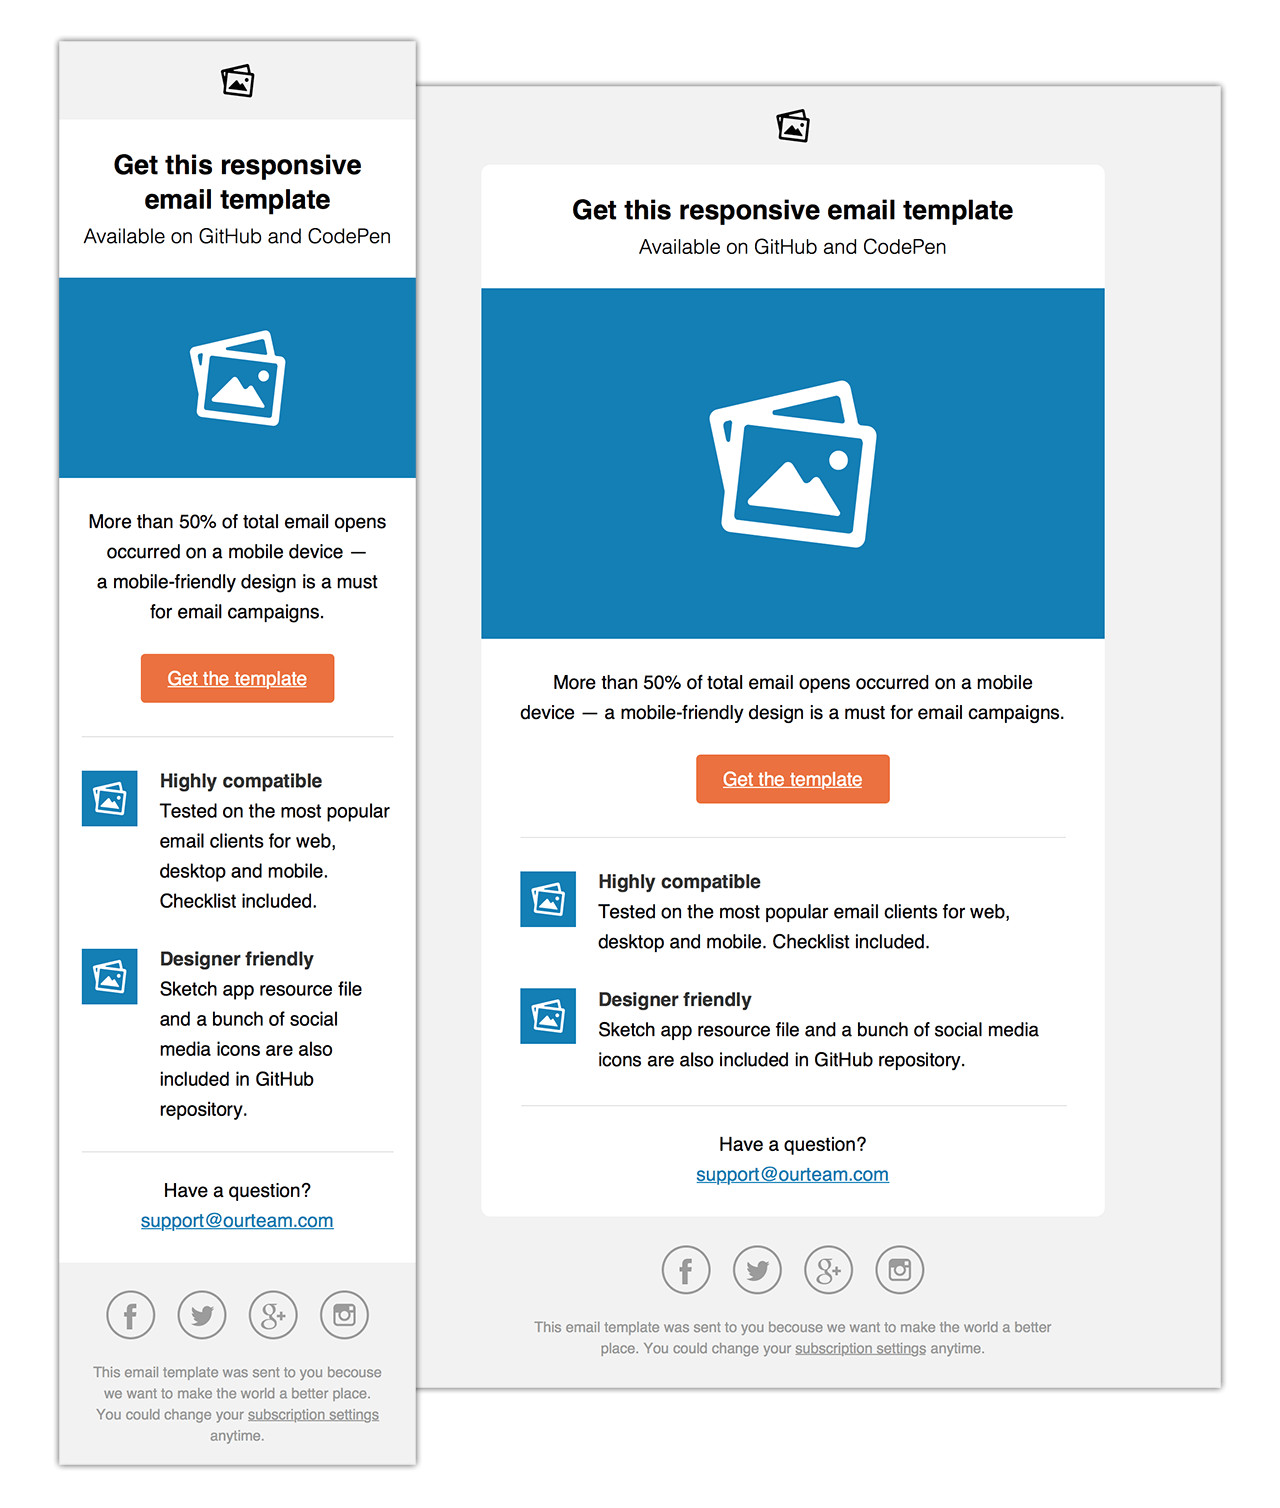 email templates konsav 115314